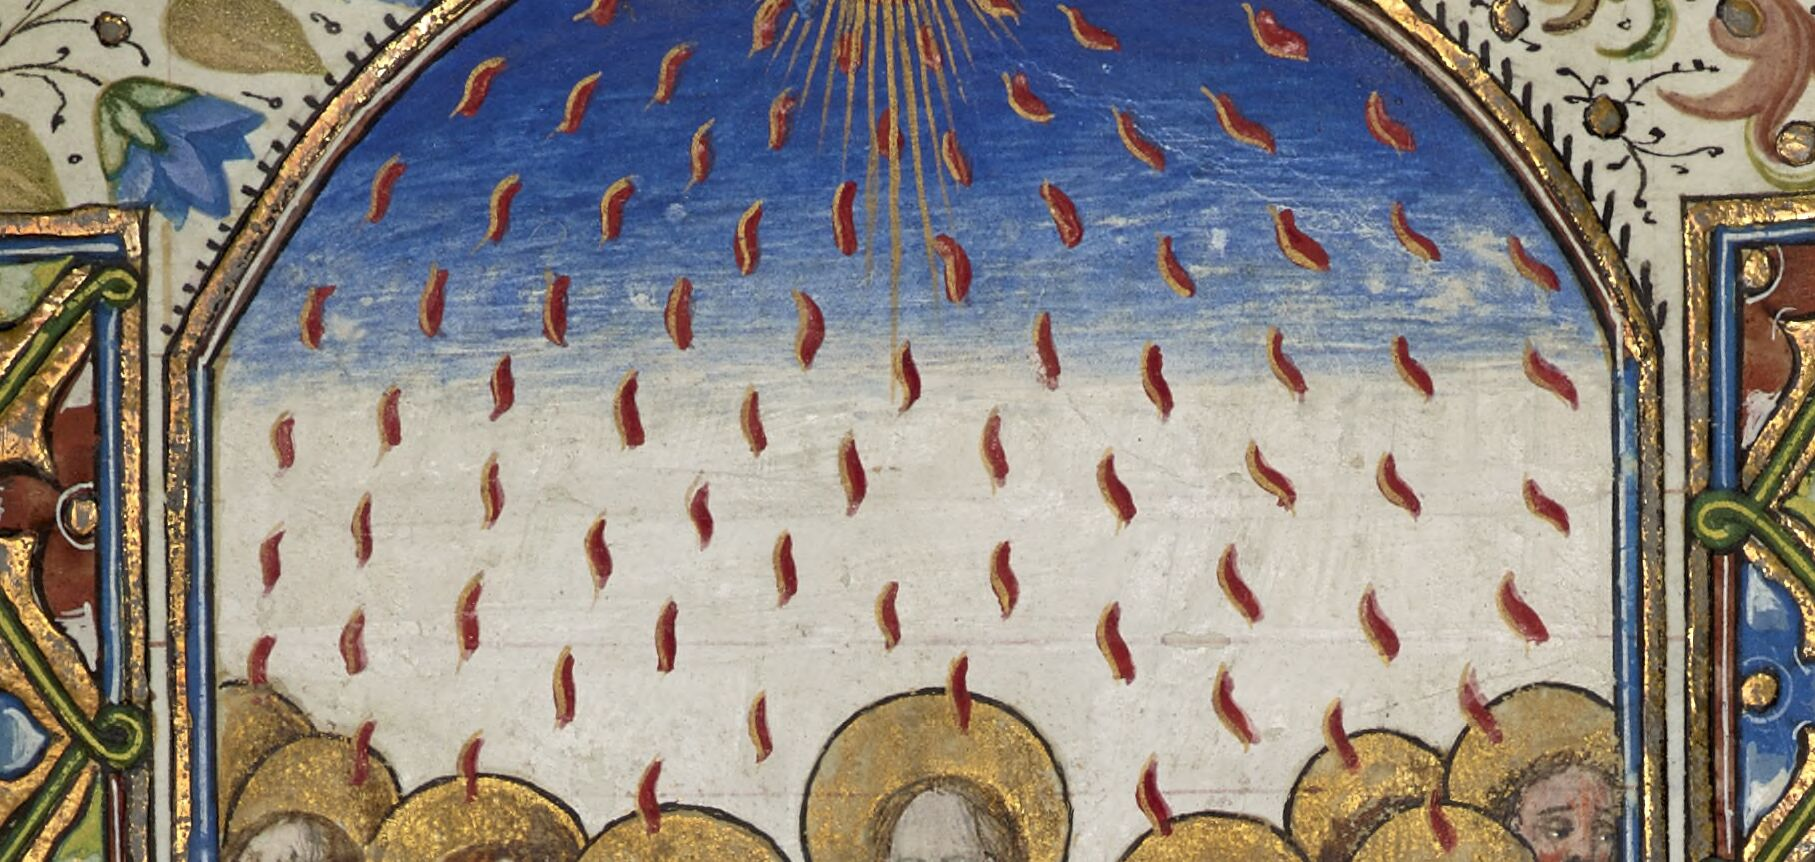 Pentecostal sky